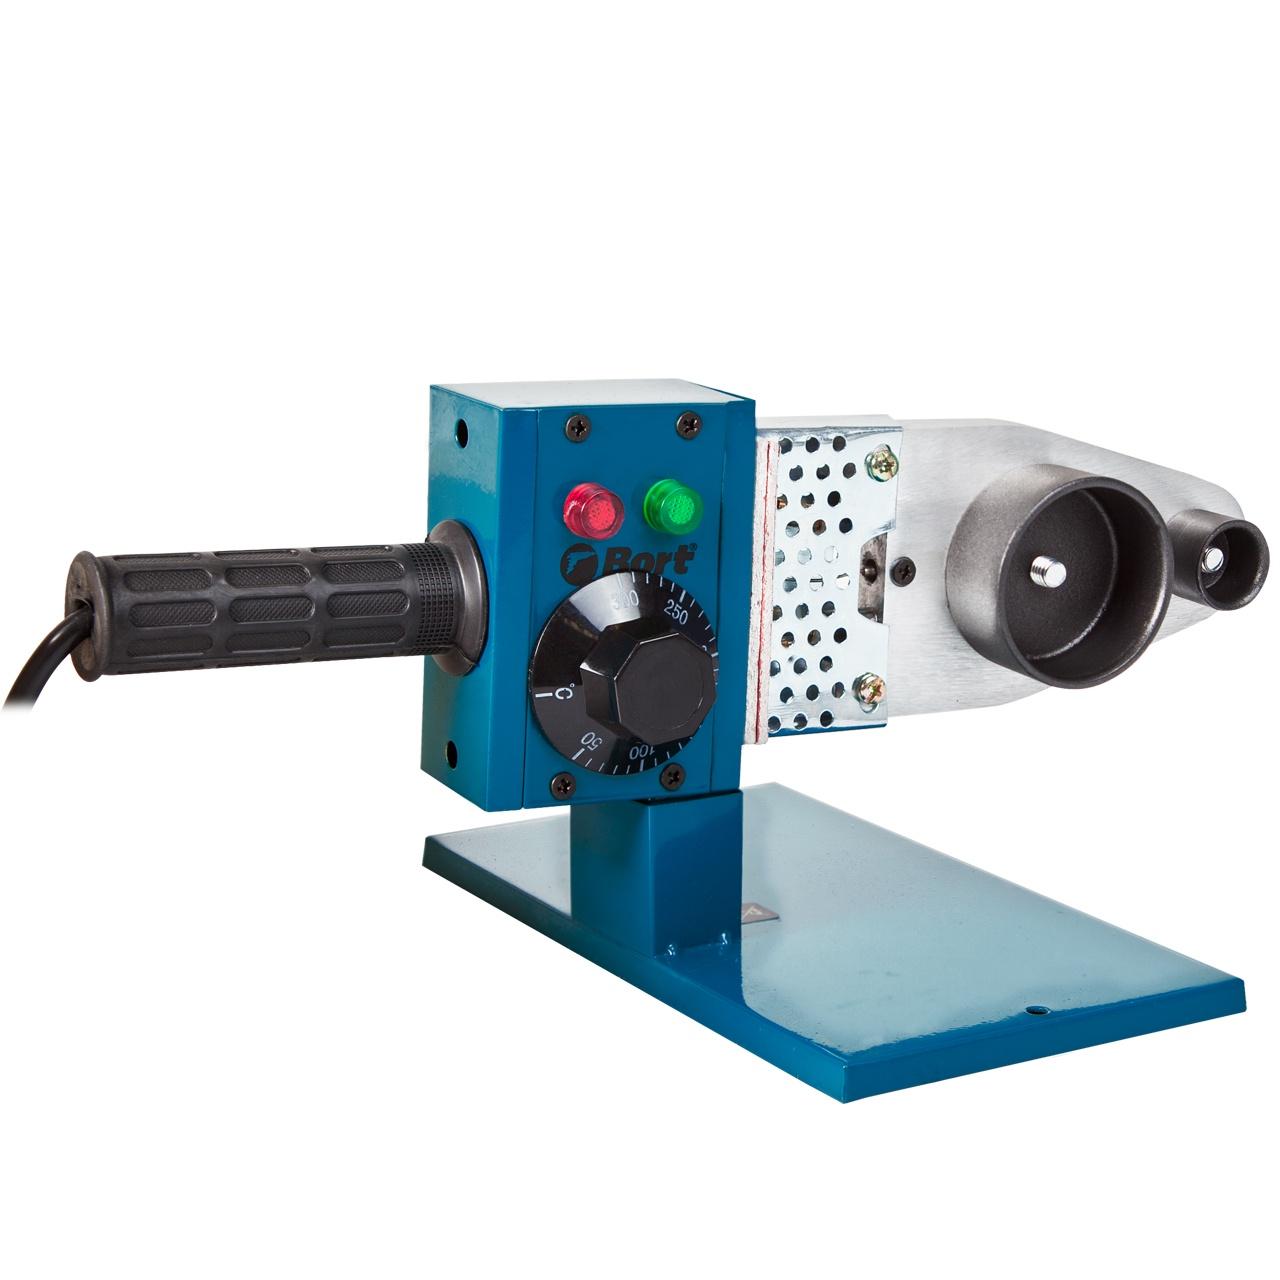 Аппарат для сварки труб Bort BRS-1000 аппарат для сварки труб bort brs 2000